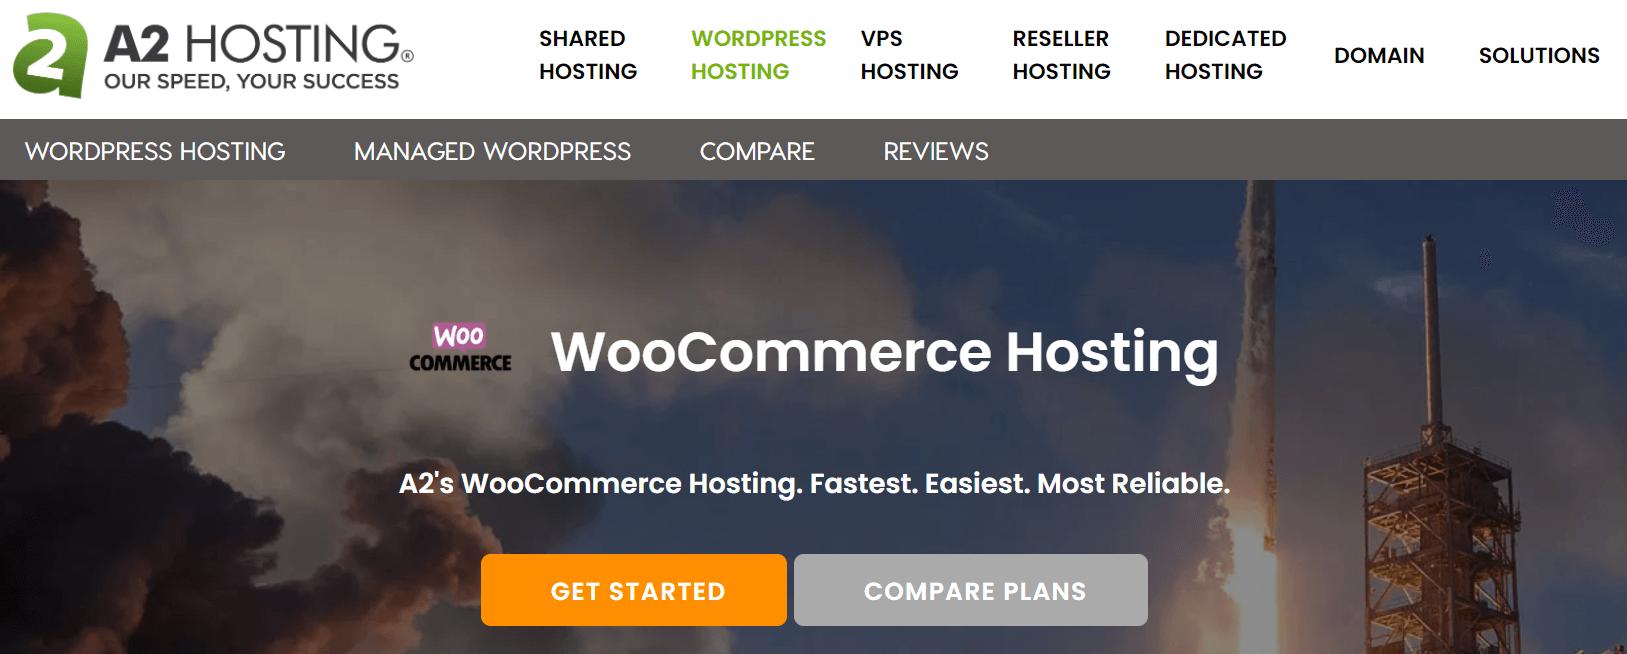 A2-hosting-woocommerce-hosting